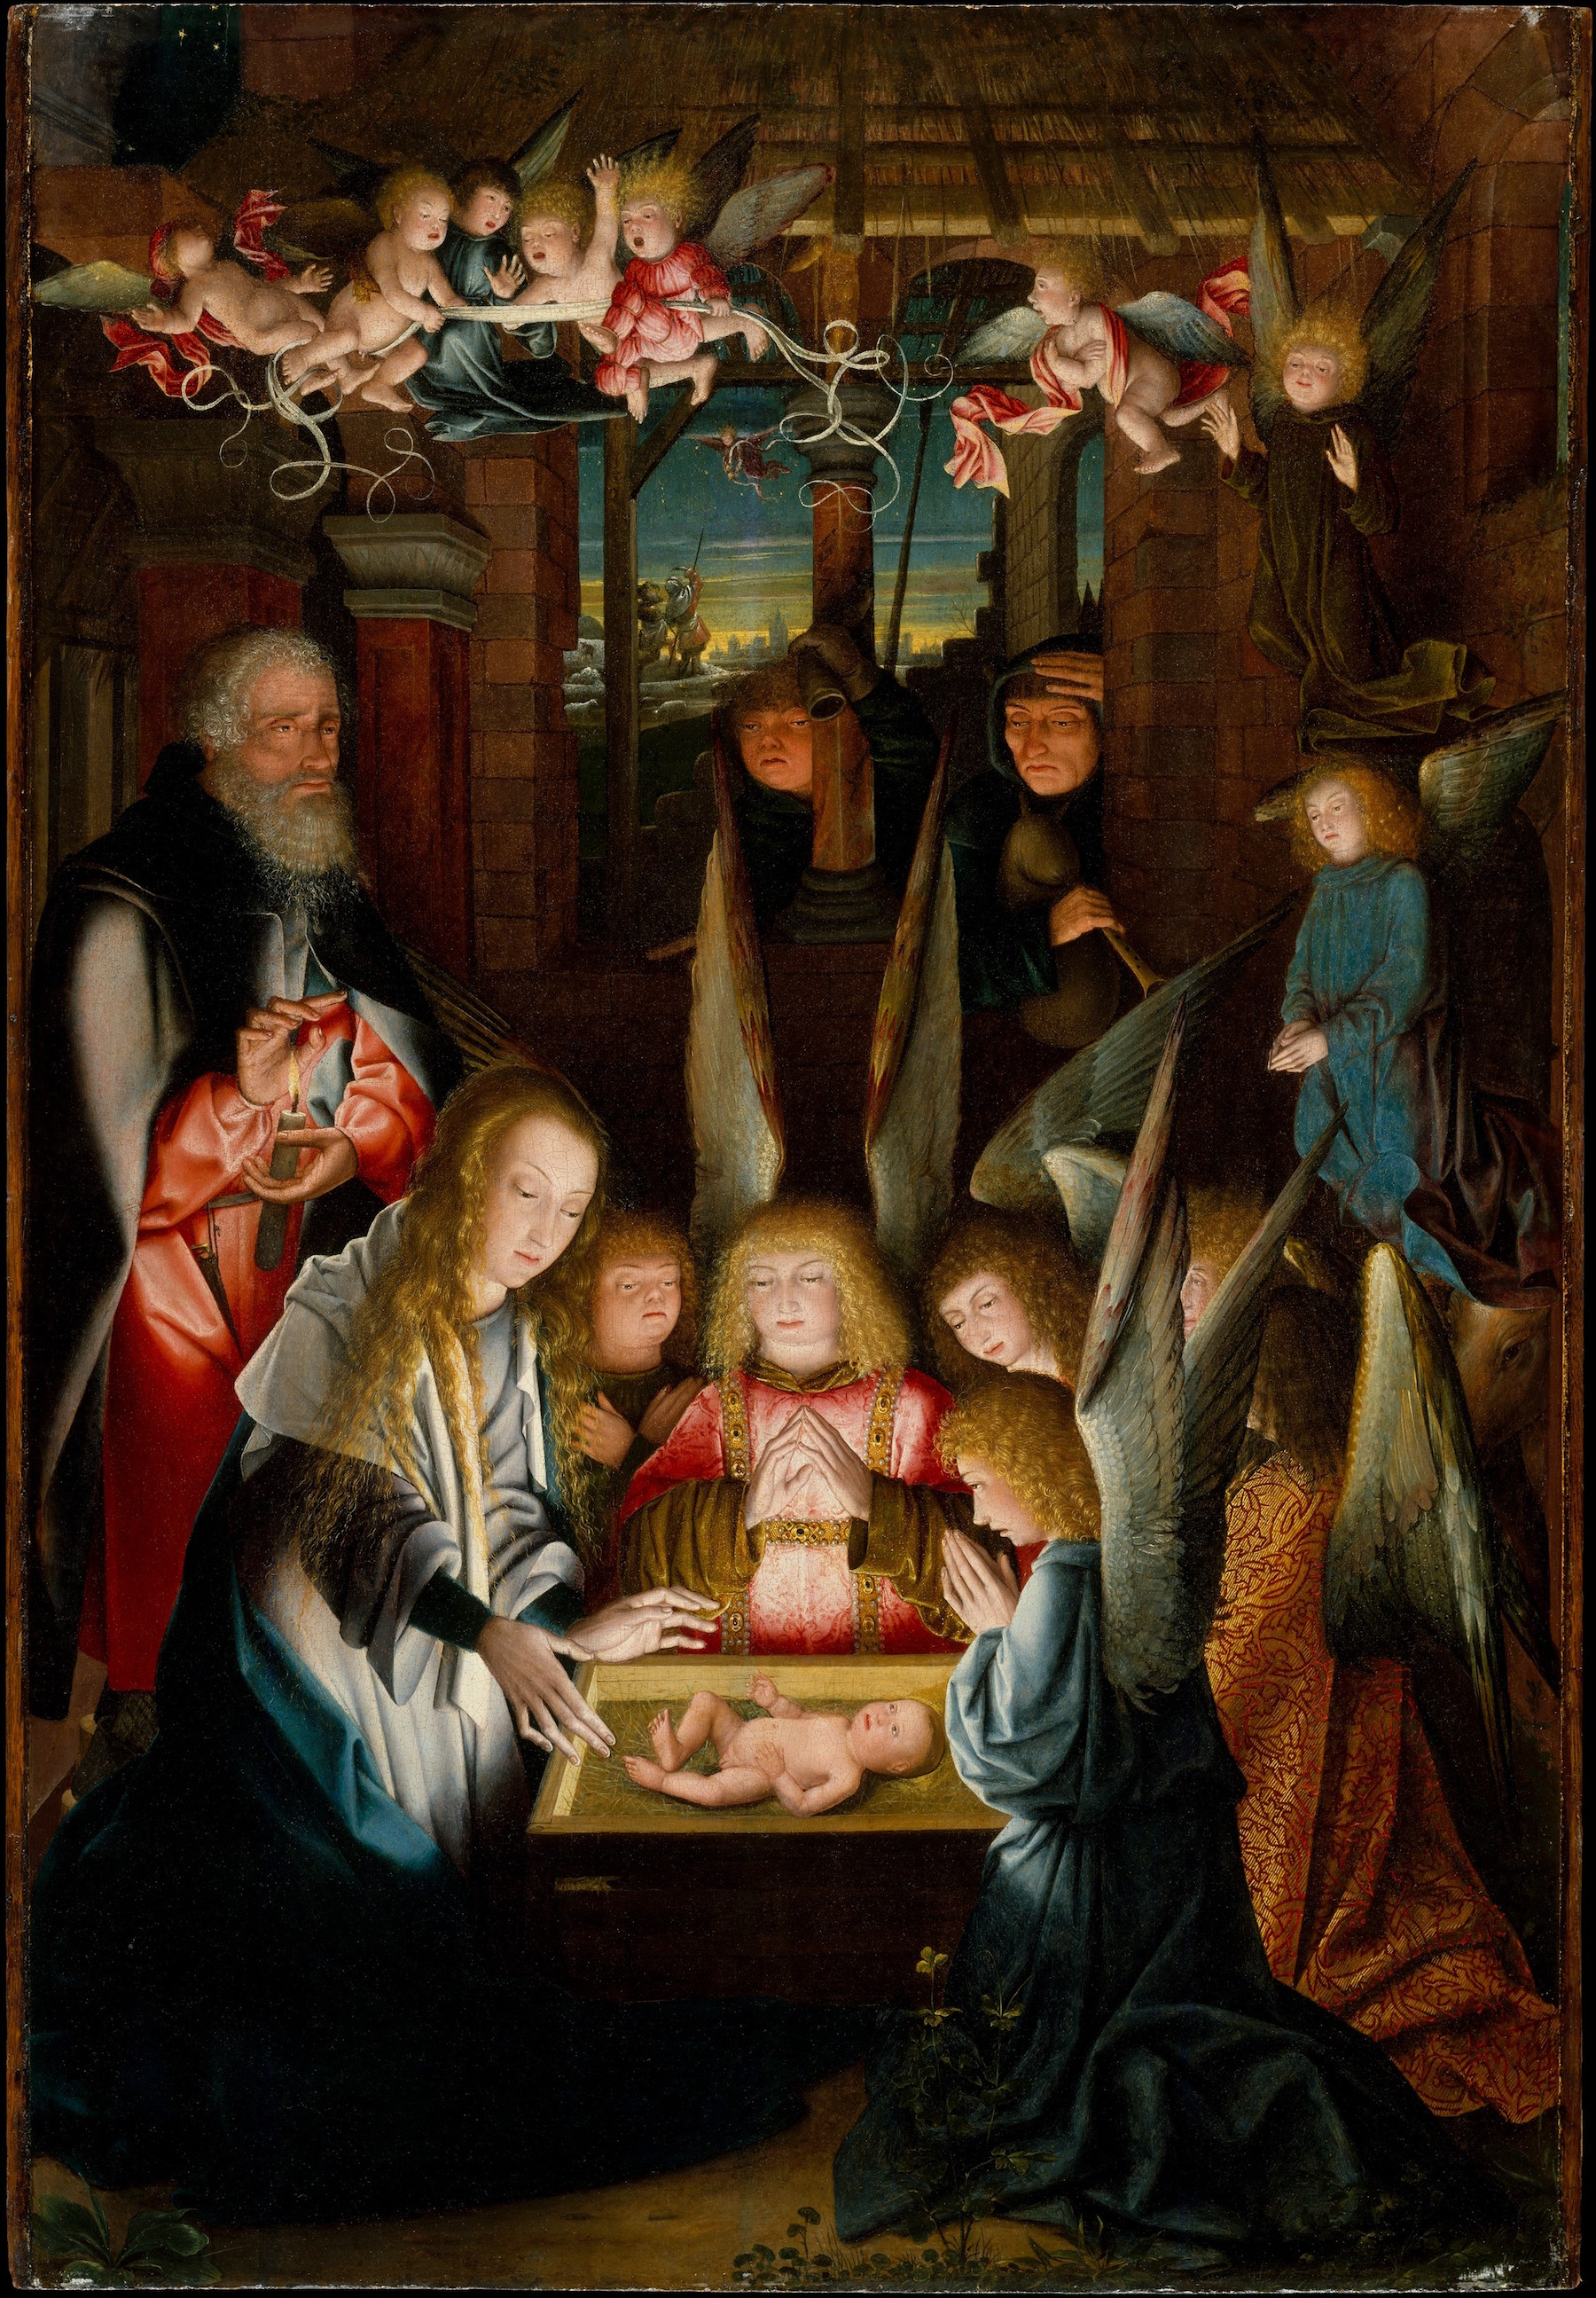 Follower of Jan Joest of Kalkar (fl. 1515), The Adoration of the Christ Child, Metropolitan Museum of Art, New York.